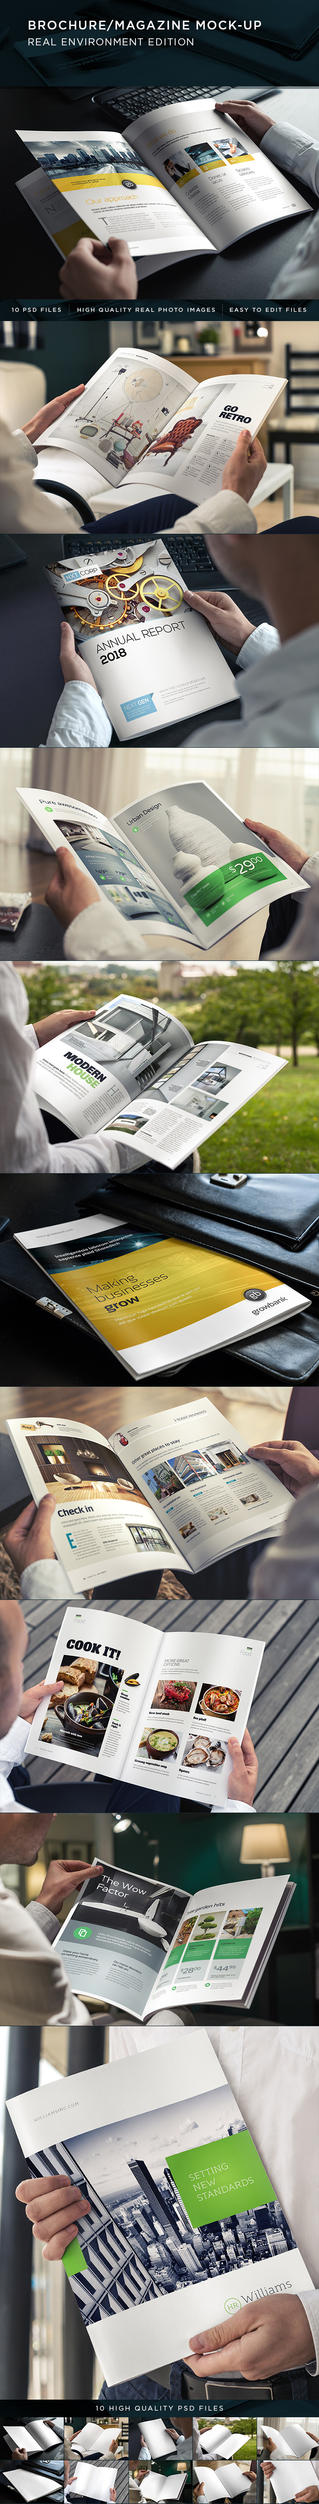 Brochure / Magazine Mock-Up by Genetic96